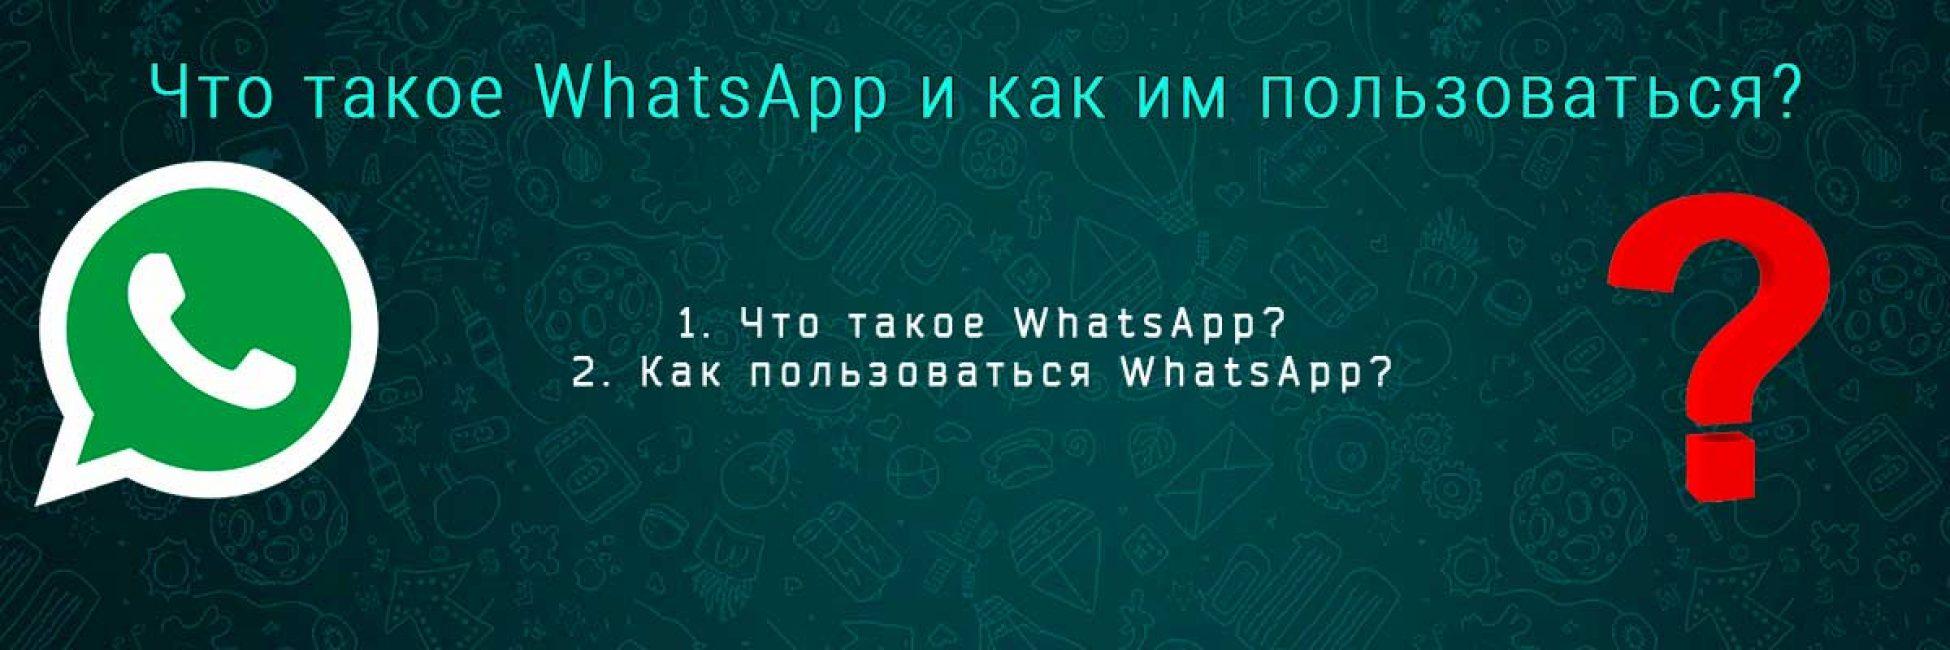 WhatsApp – популярное приложение